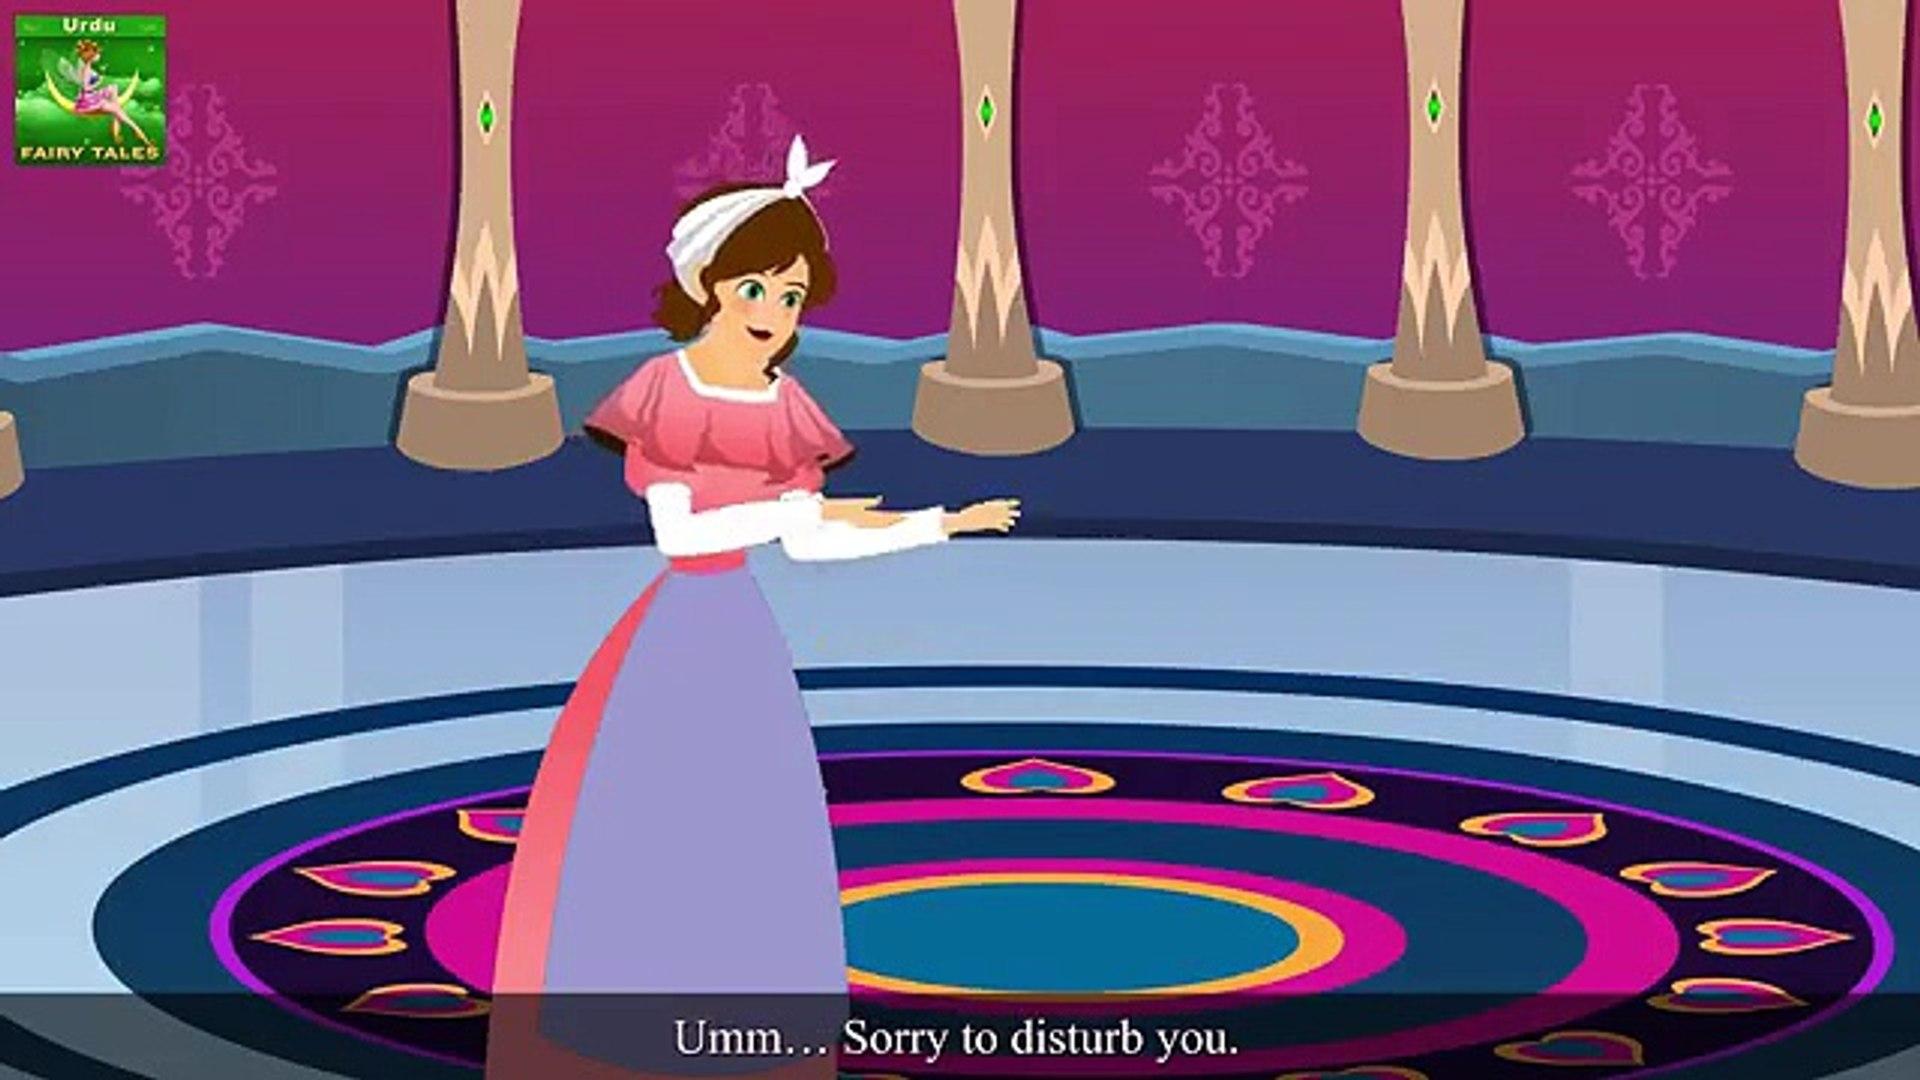 سست لڑکی - Lazy Girl in Urdu - Urdu Story - Urdu Fairy Tales